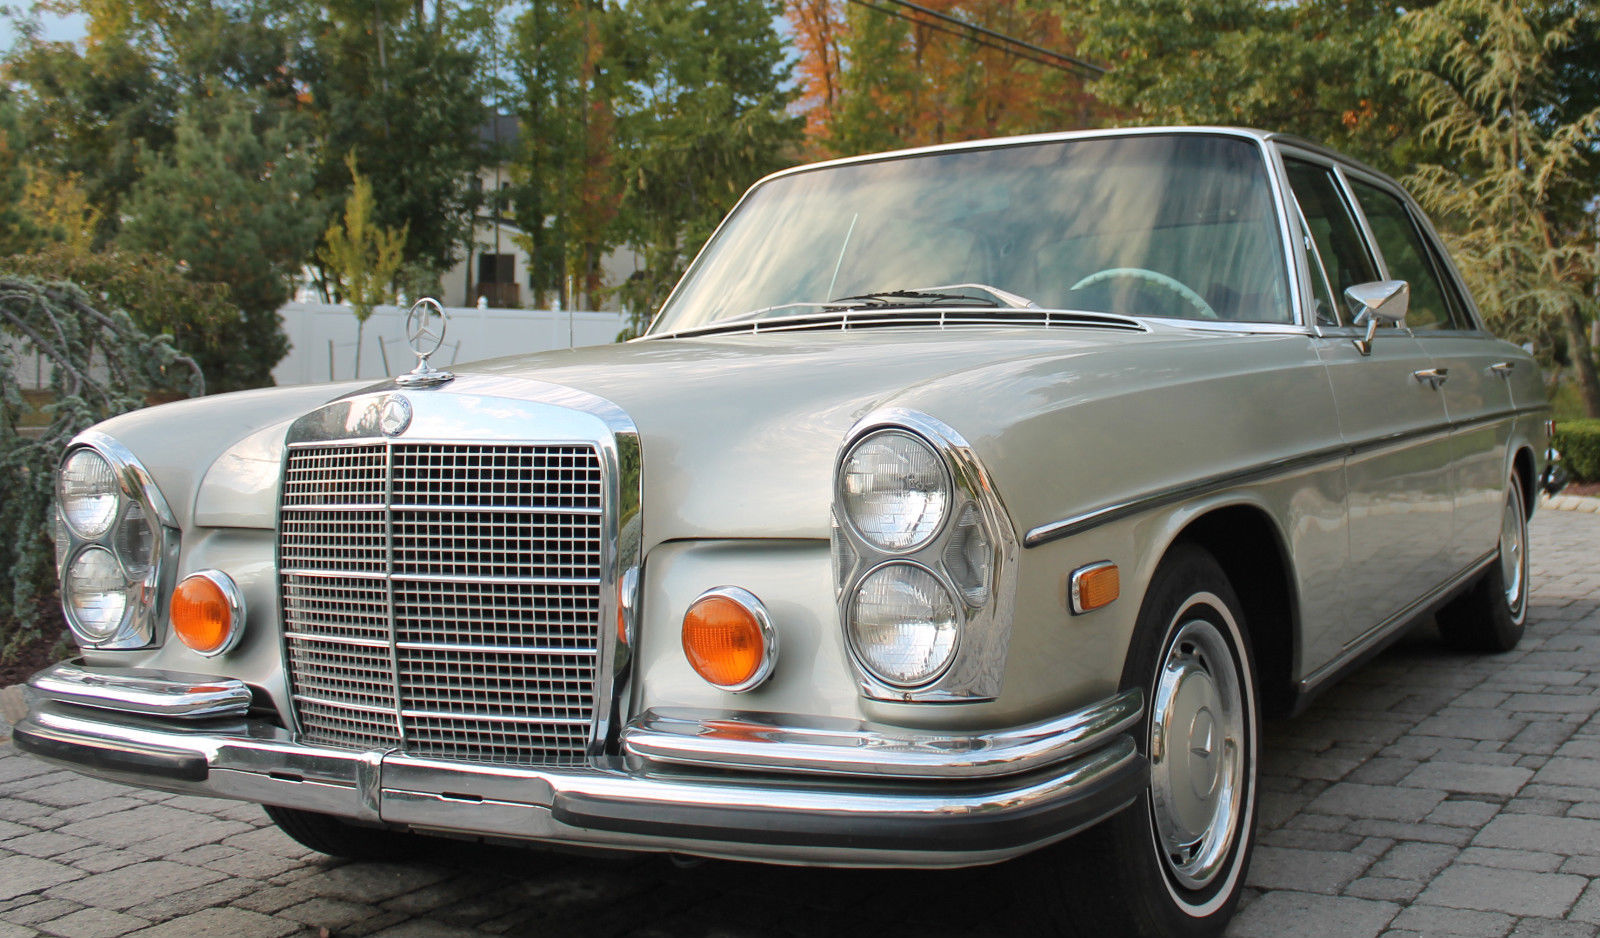 1973 mercedes benz 280sel 4 5 liter 94k 108 floor shift for 5 series mercedes benz